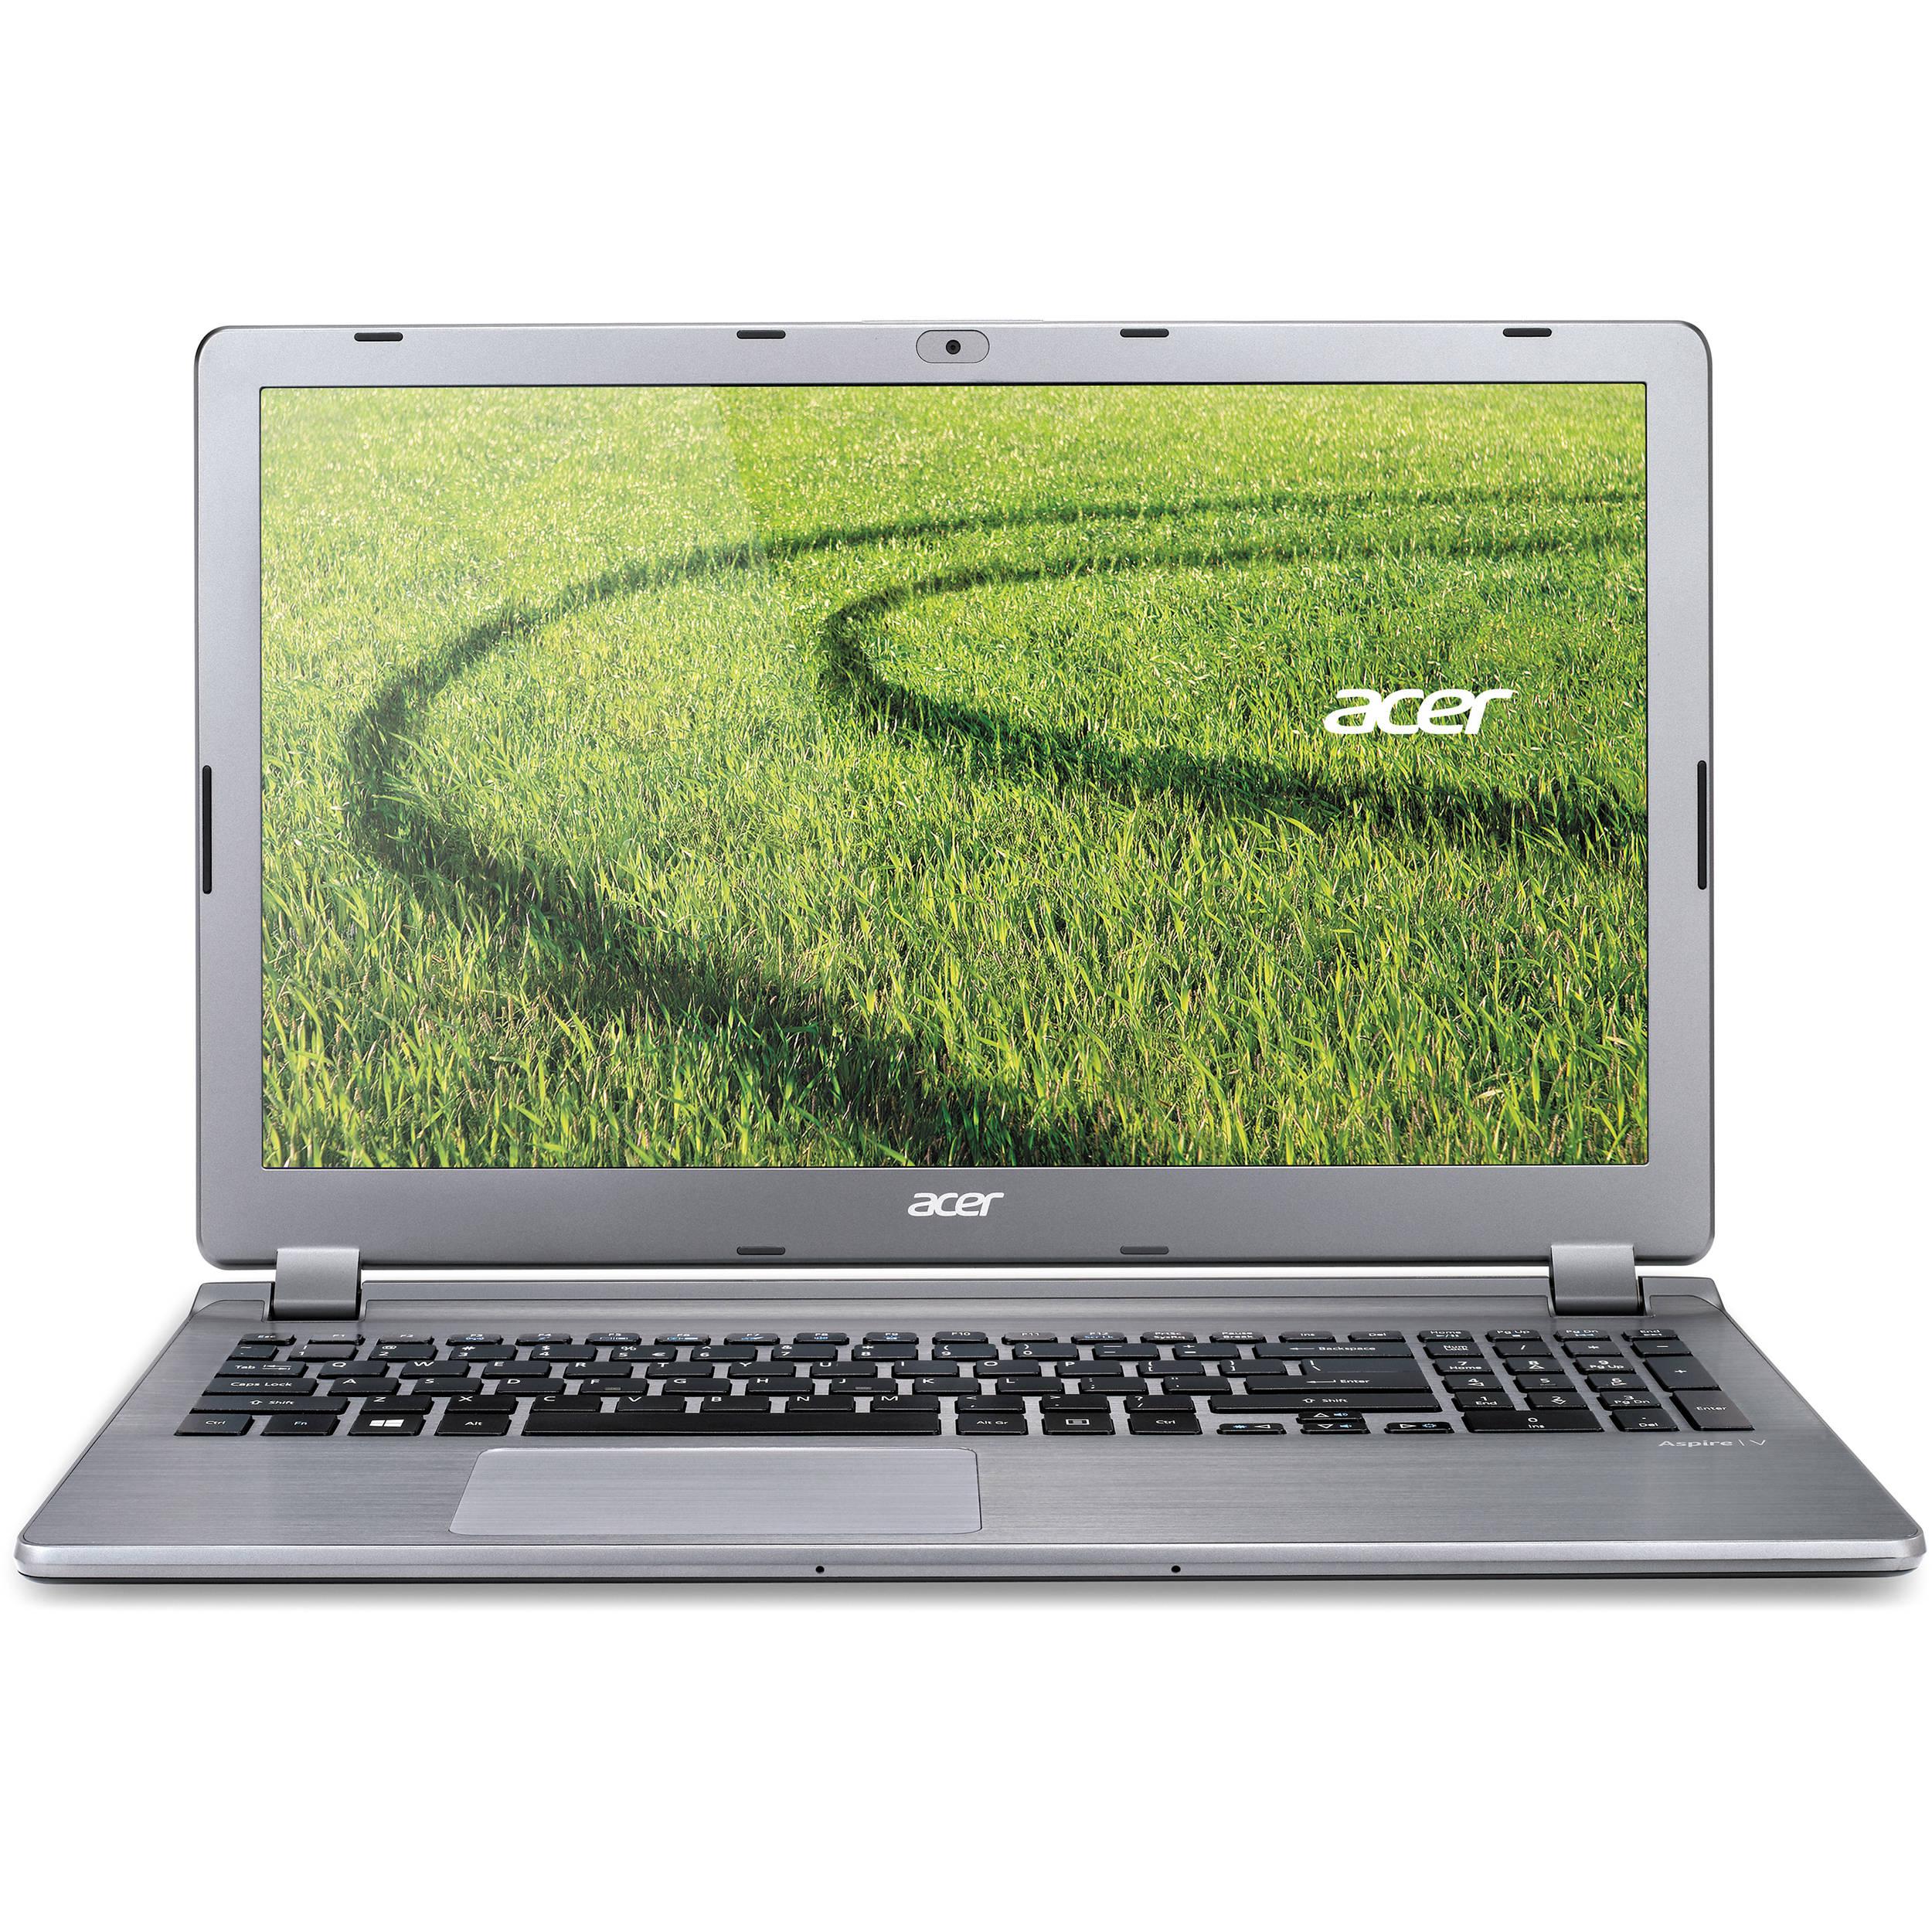 acer aspire v5 552 8677 15 6 notebook computer rh bhphotovideo com acer laptop manual download acer laptop manual pdf